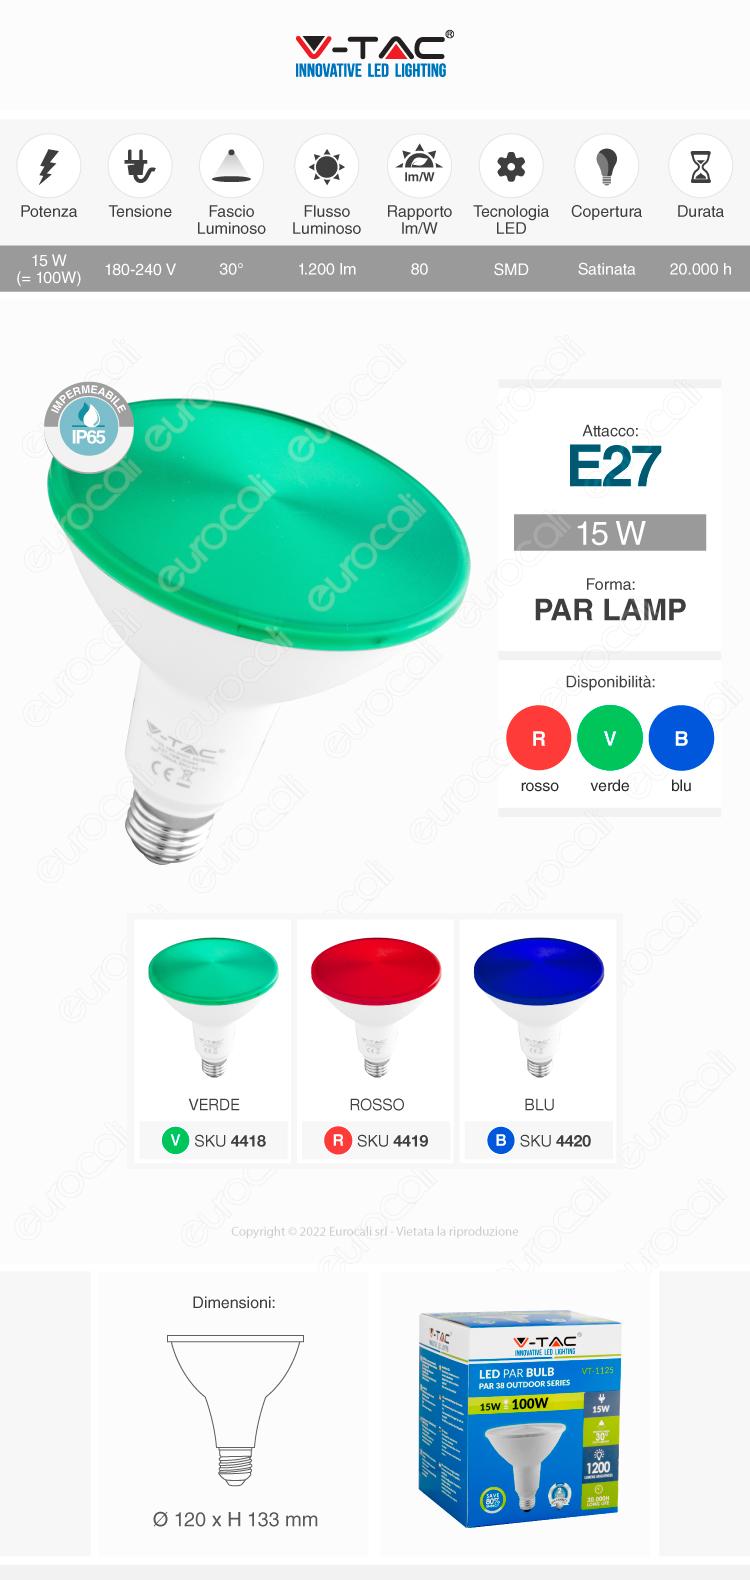 Lampada LED E27 PAR38 V-Tac